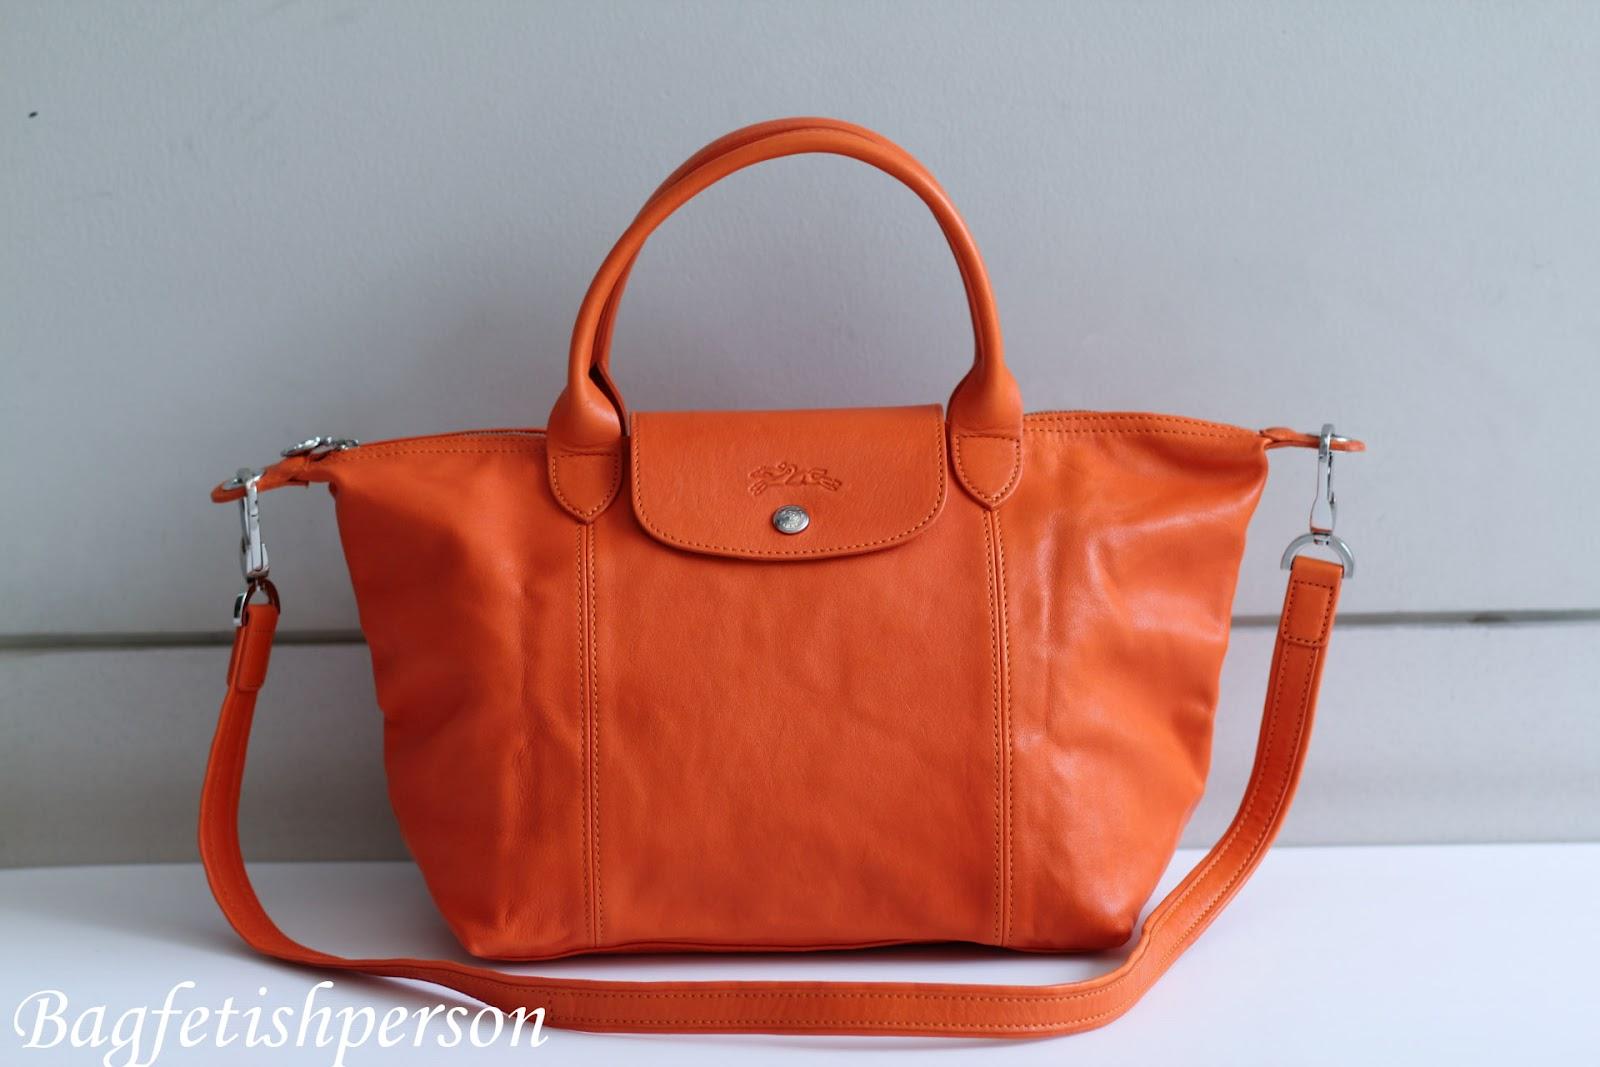 bagfetishperson longchamp le pliage cuir orange. Black Bedroom Furniture Sets. Home Design Ideas